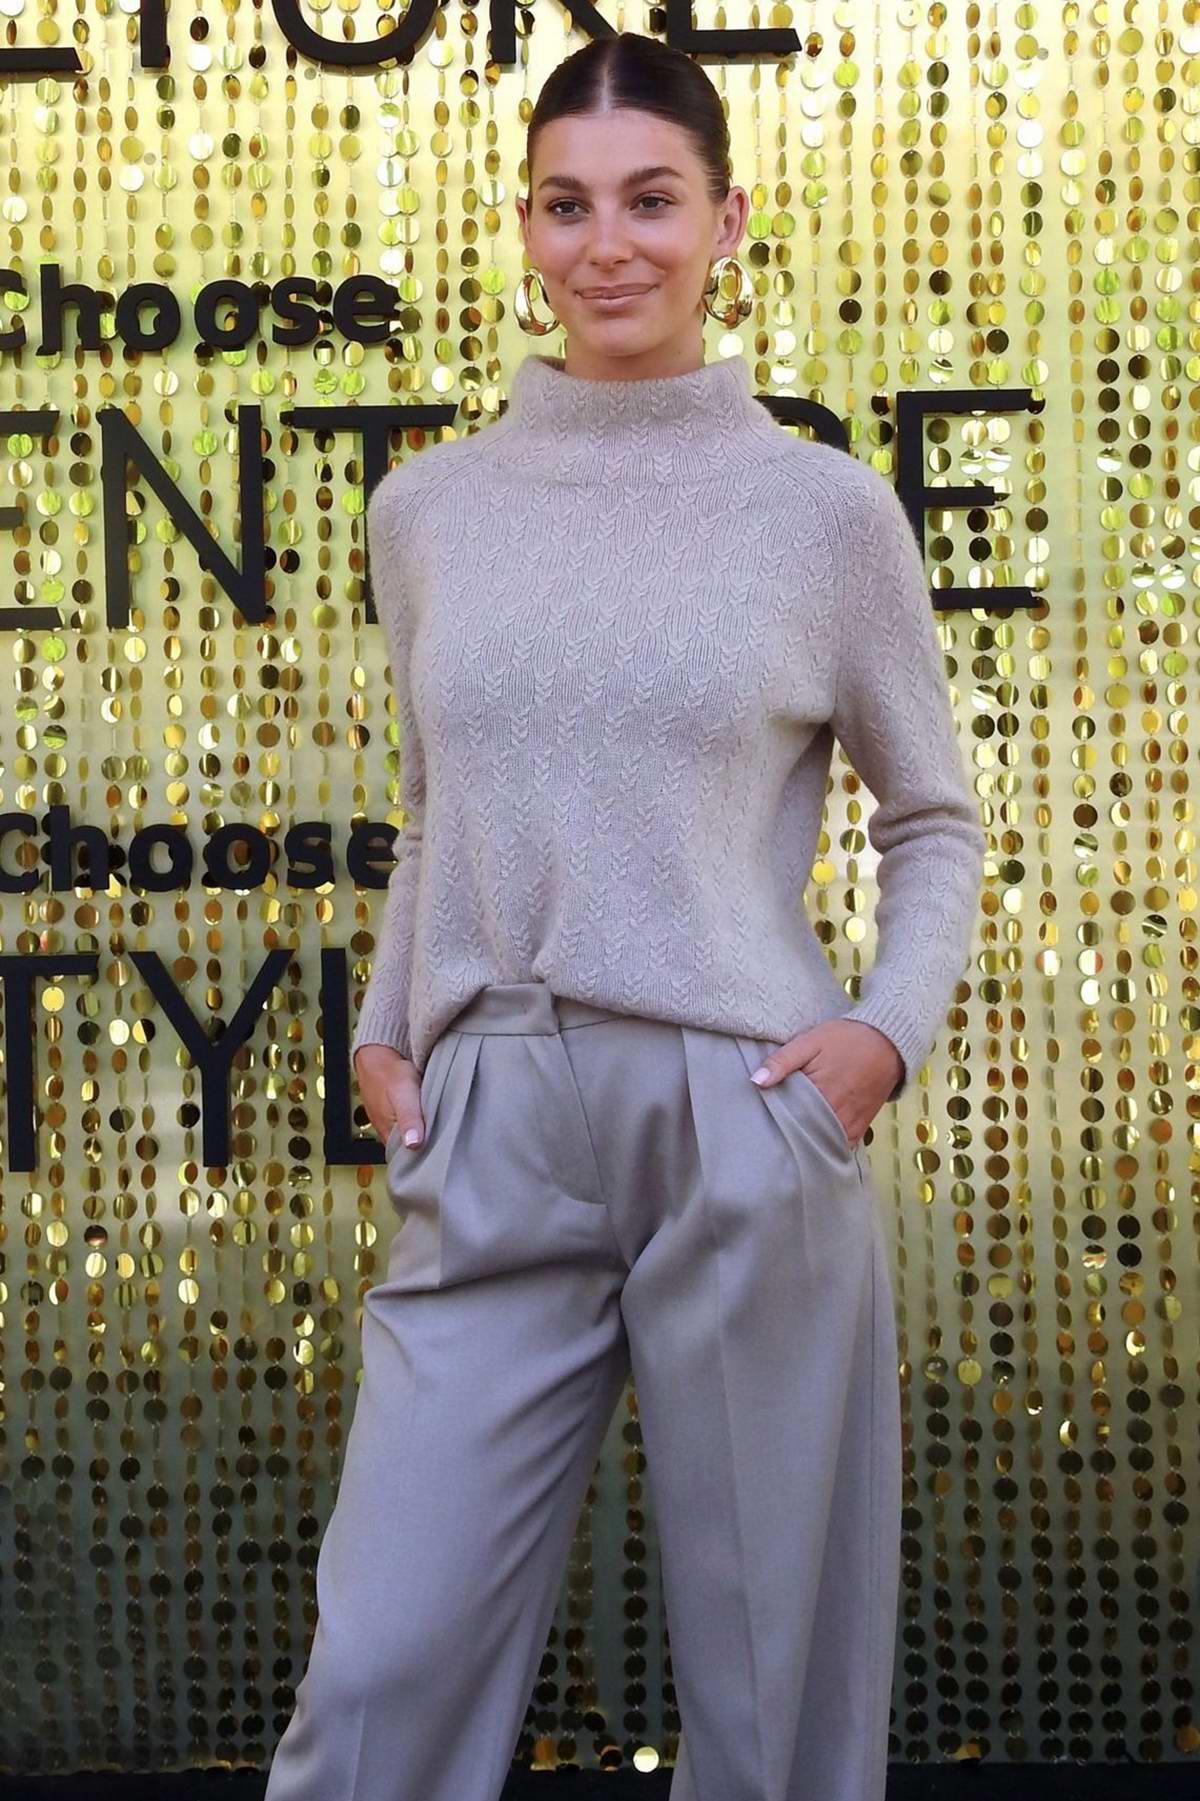 Camila Morrone attends the Lola Casademunt photocall during 080 Barcelona Fashion Week in Barcelona, Spain